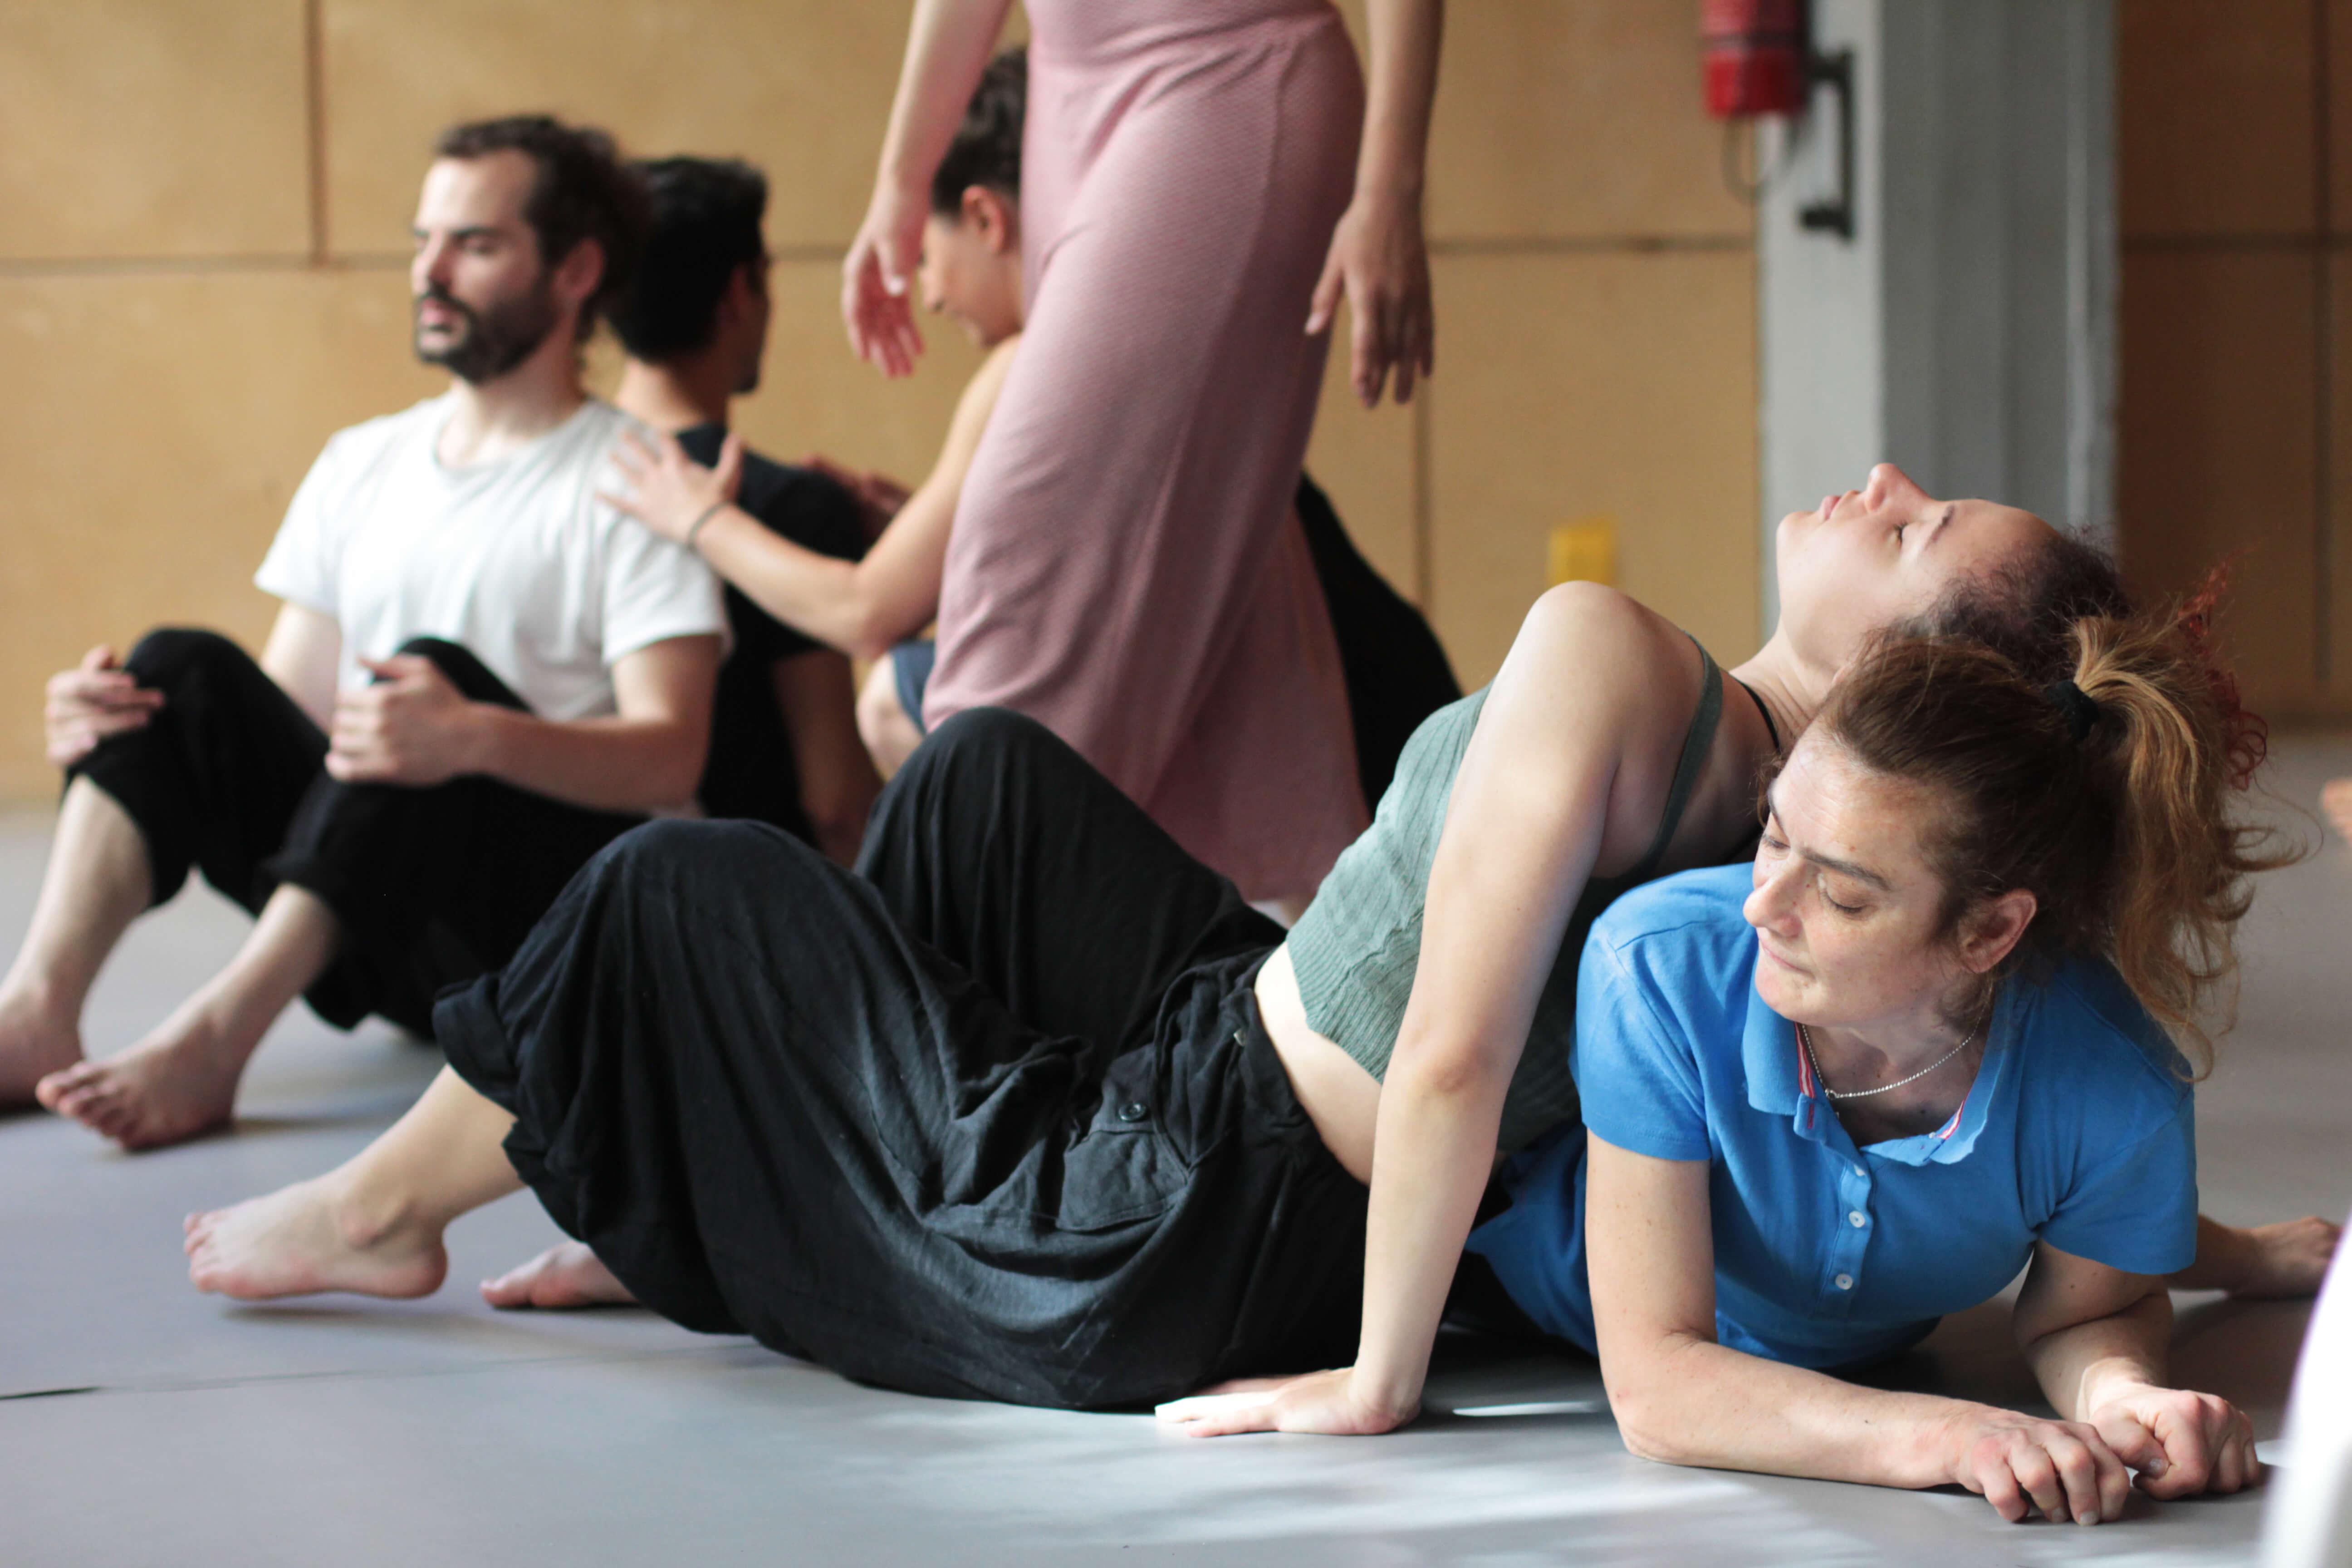 kymaproject χορός στο πάτωμα με ή χωρίς αναπηρίες | YouBeHero